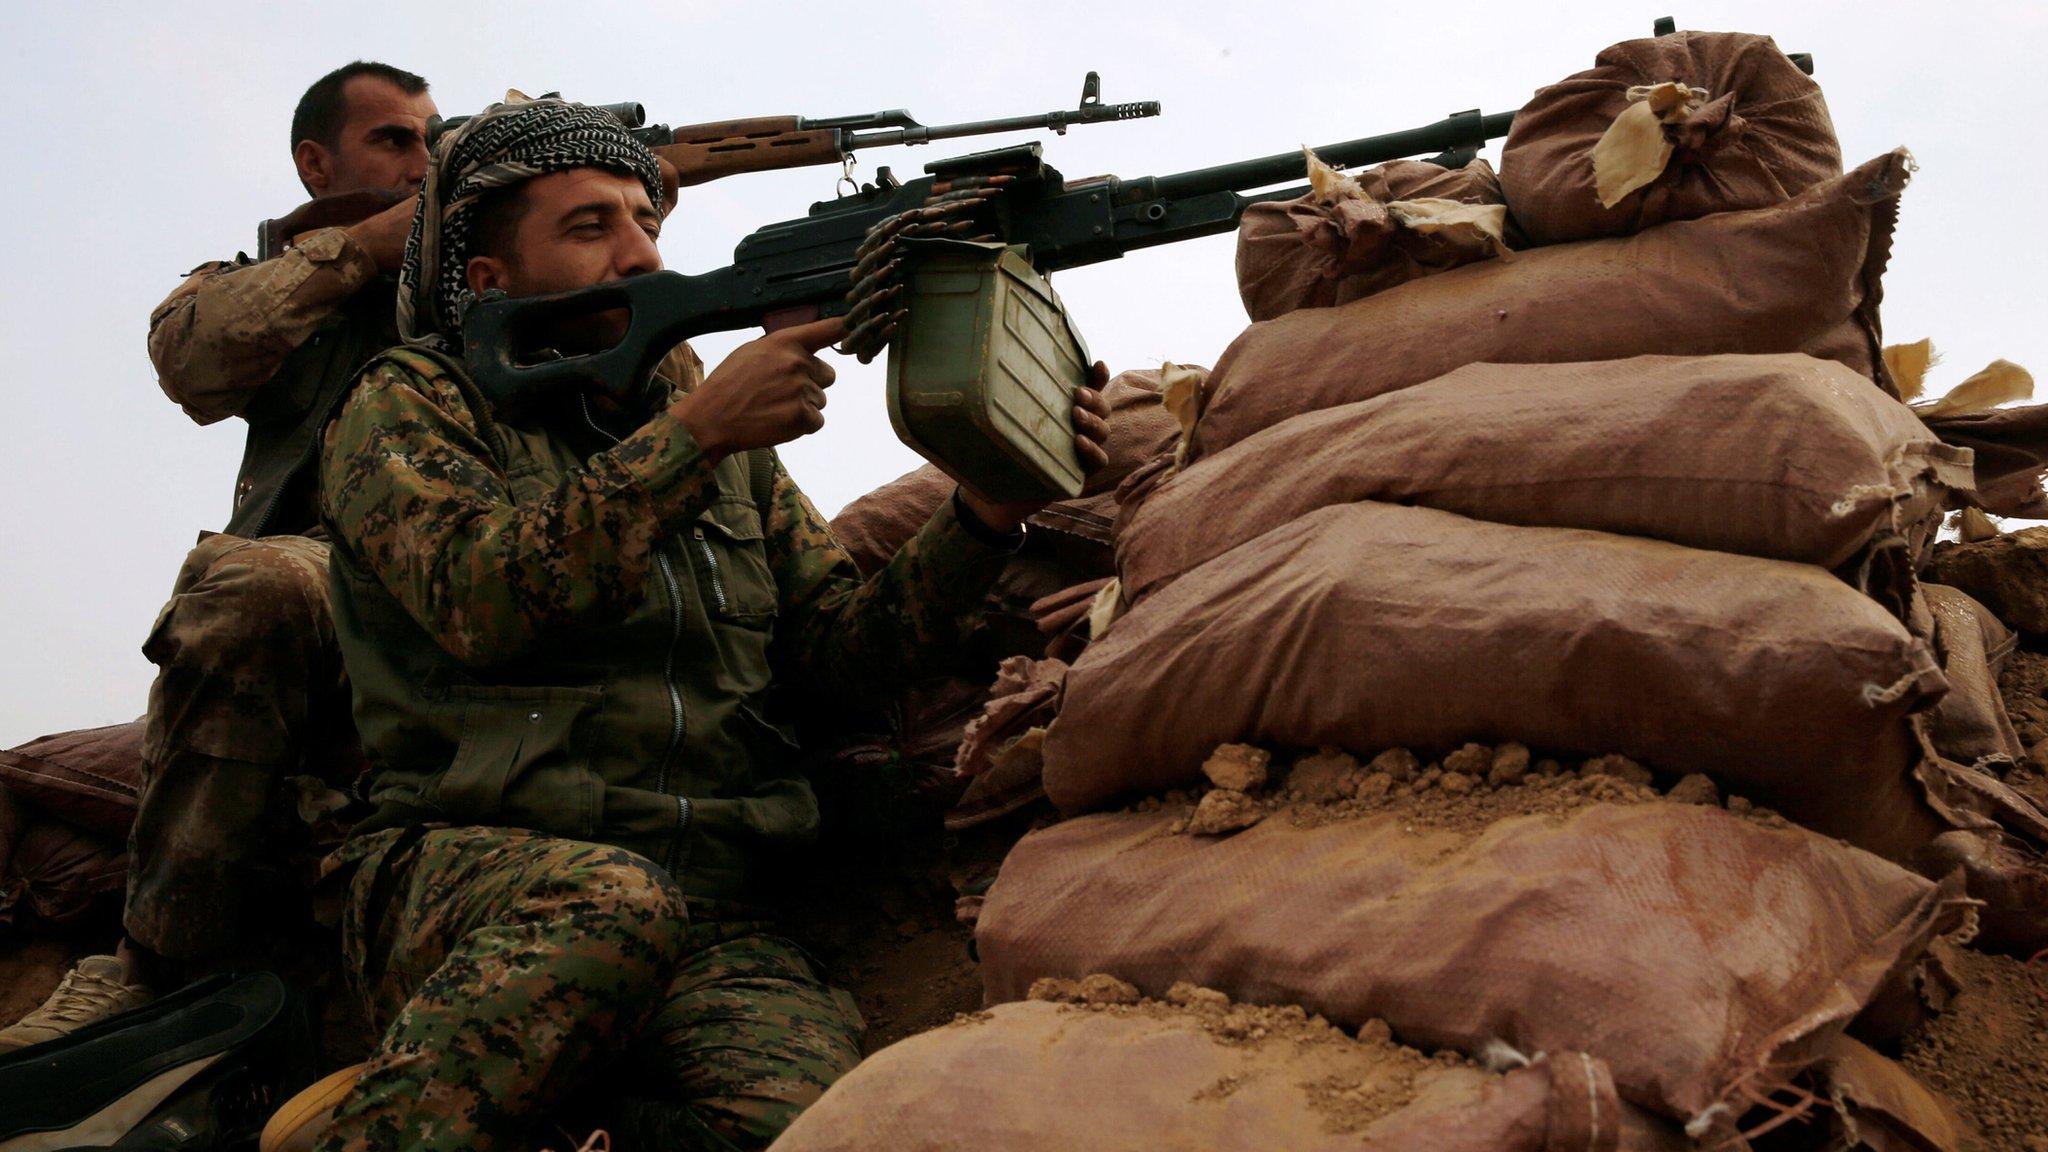 Mosul offensive: Iraqi Kurdish forces besiege key town of Bashiqa